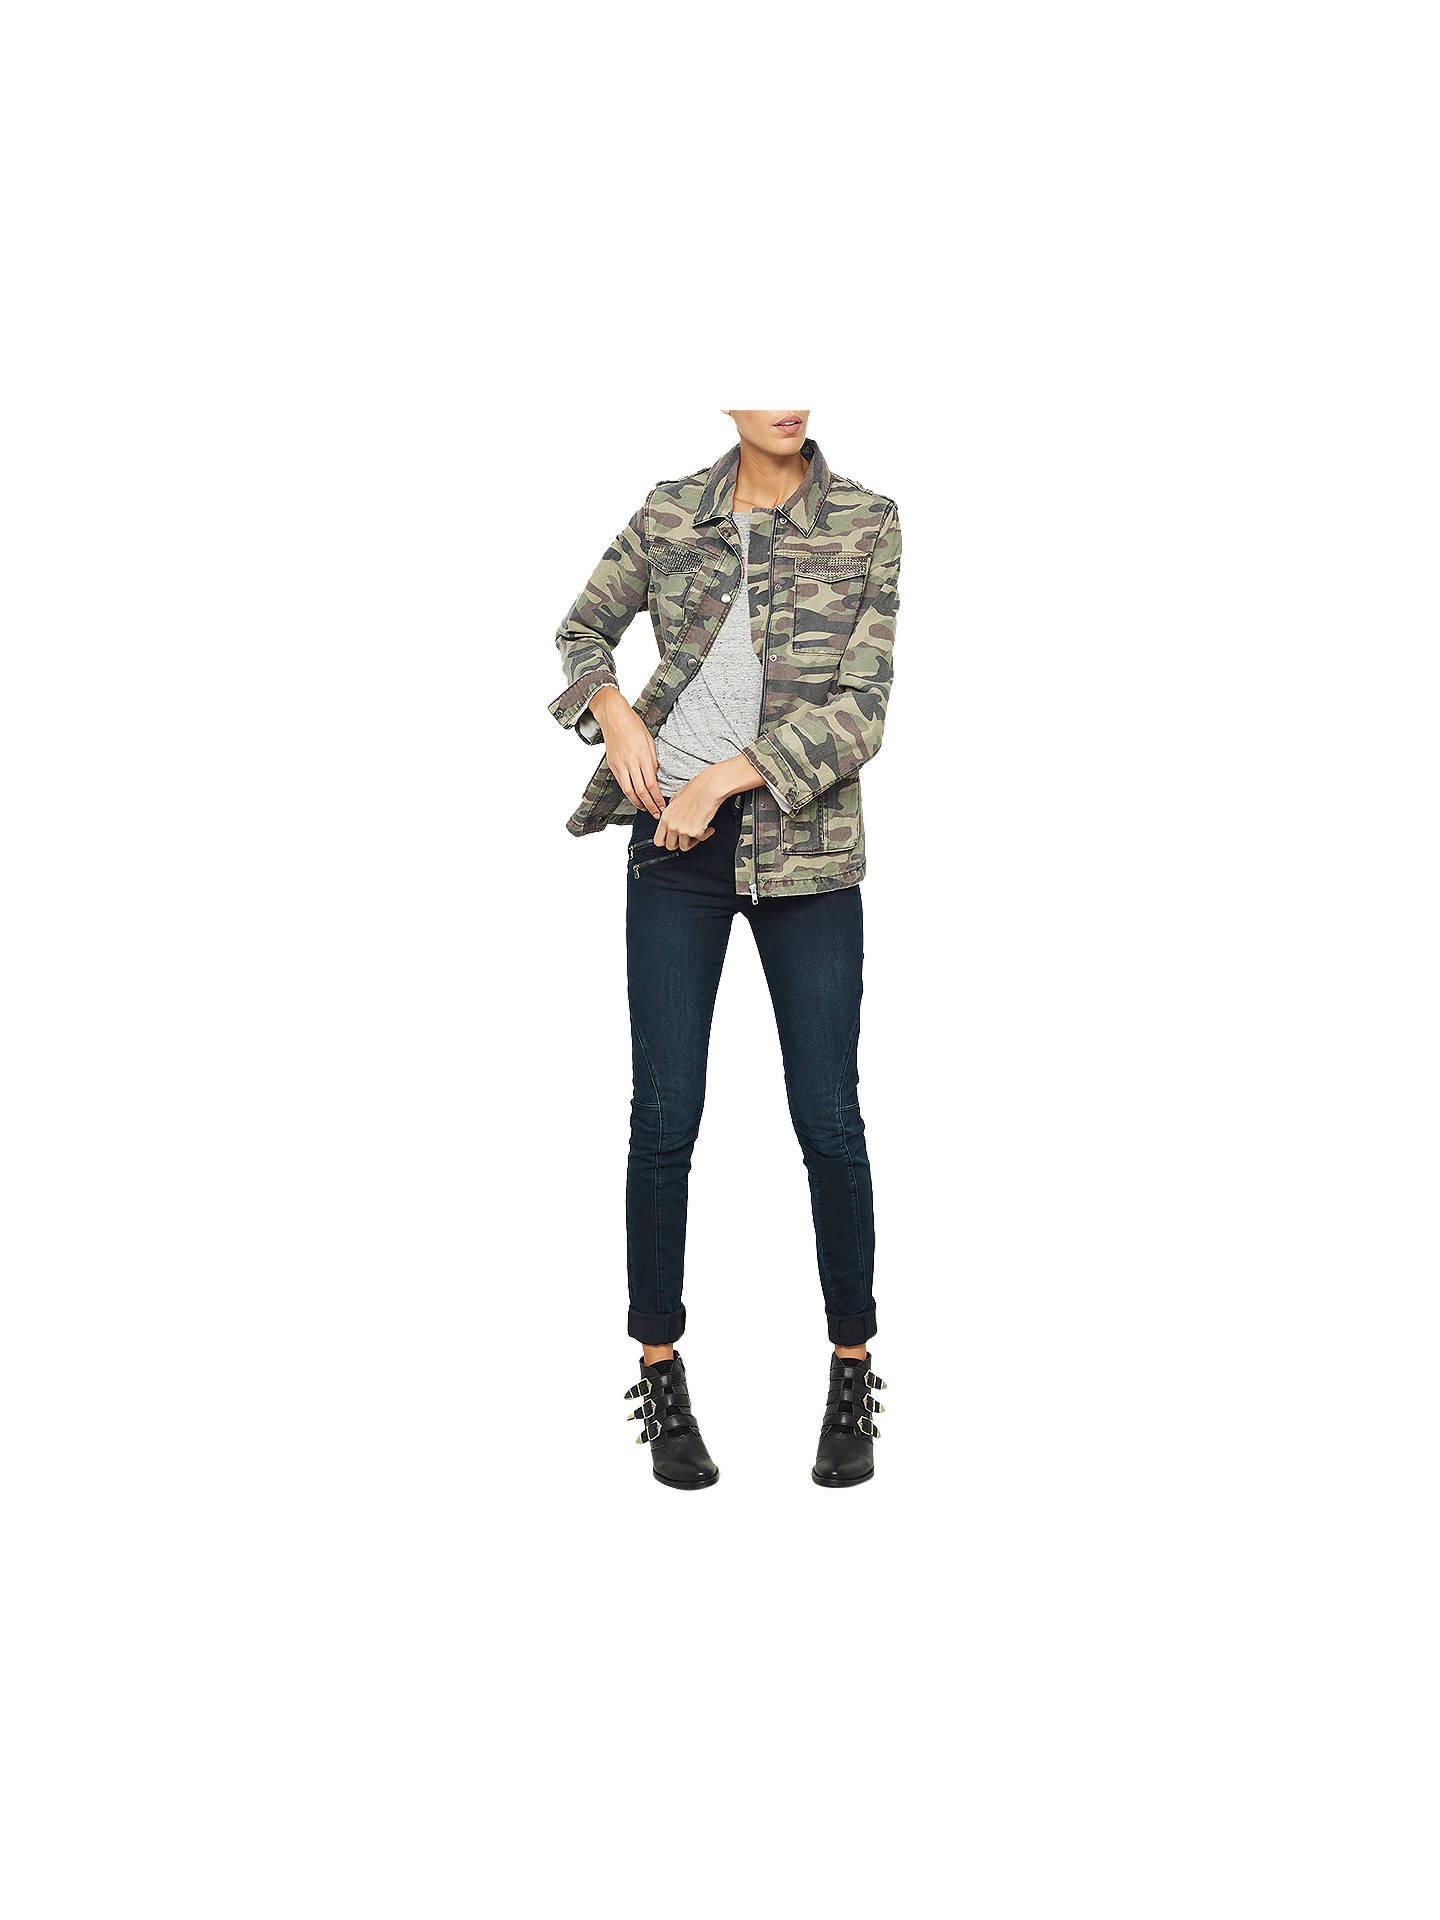 6337dd9062132 ... Buy Mint Velvet Camouflage Jacket, Green, 6 Online at johnlewis.com ...